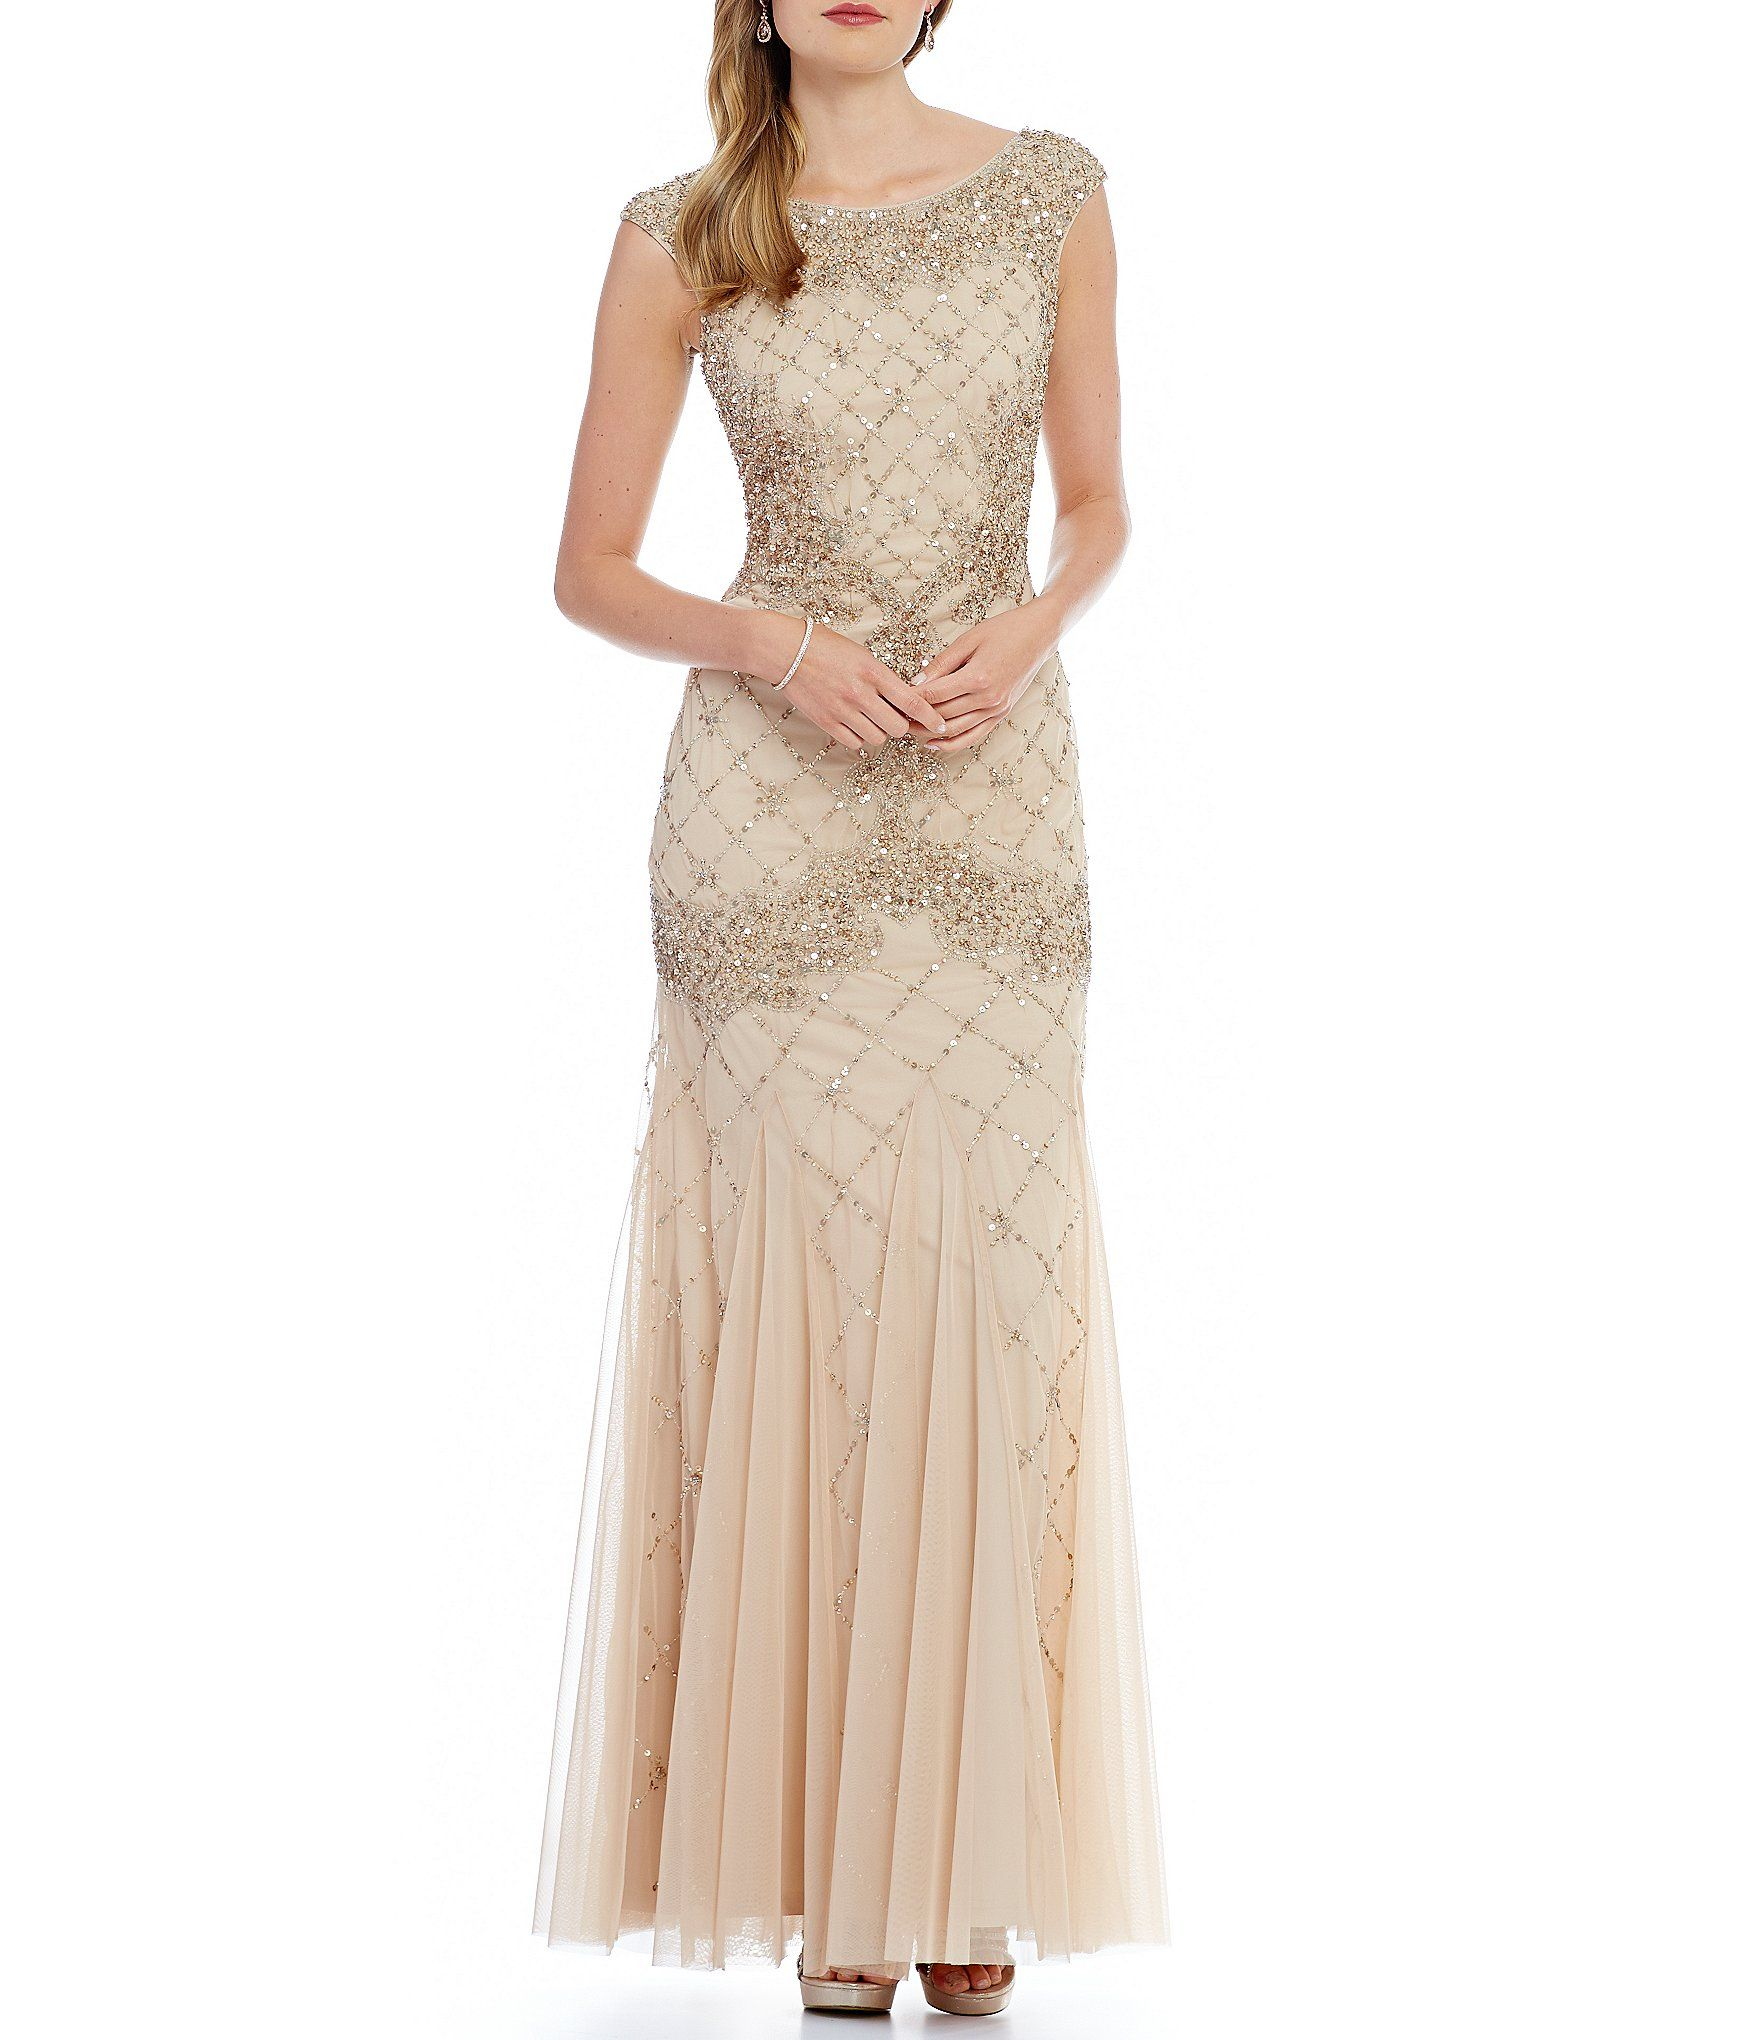 Wedding dresses dillards  Dillards  Bridesmaids  Pinterest  Dillards Bride gowns and Bride